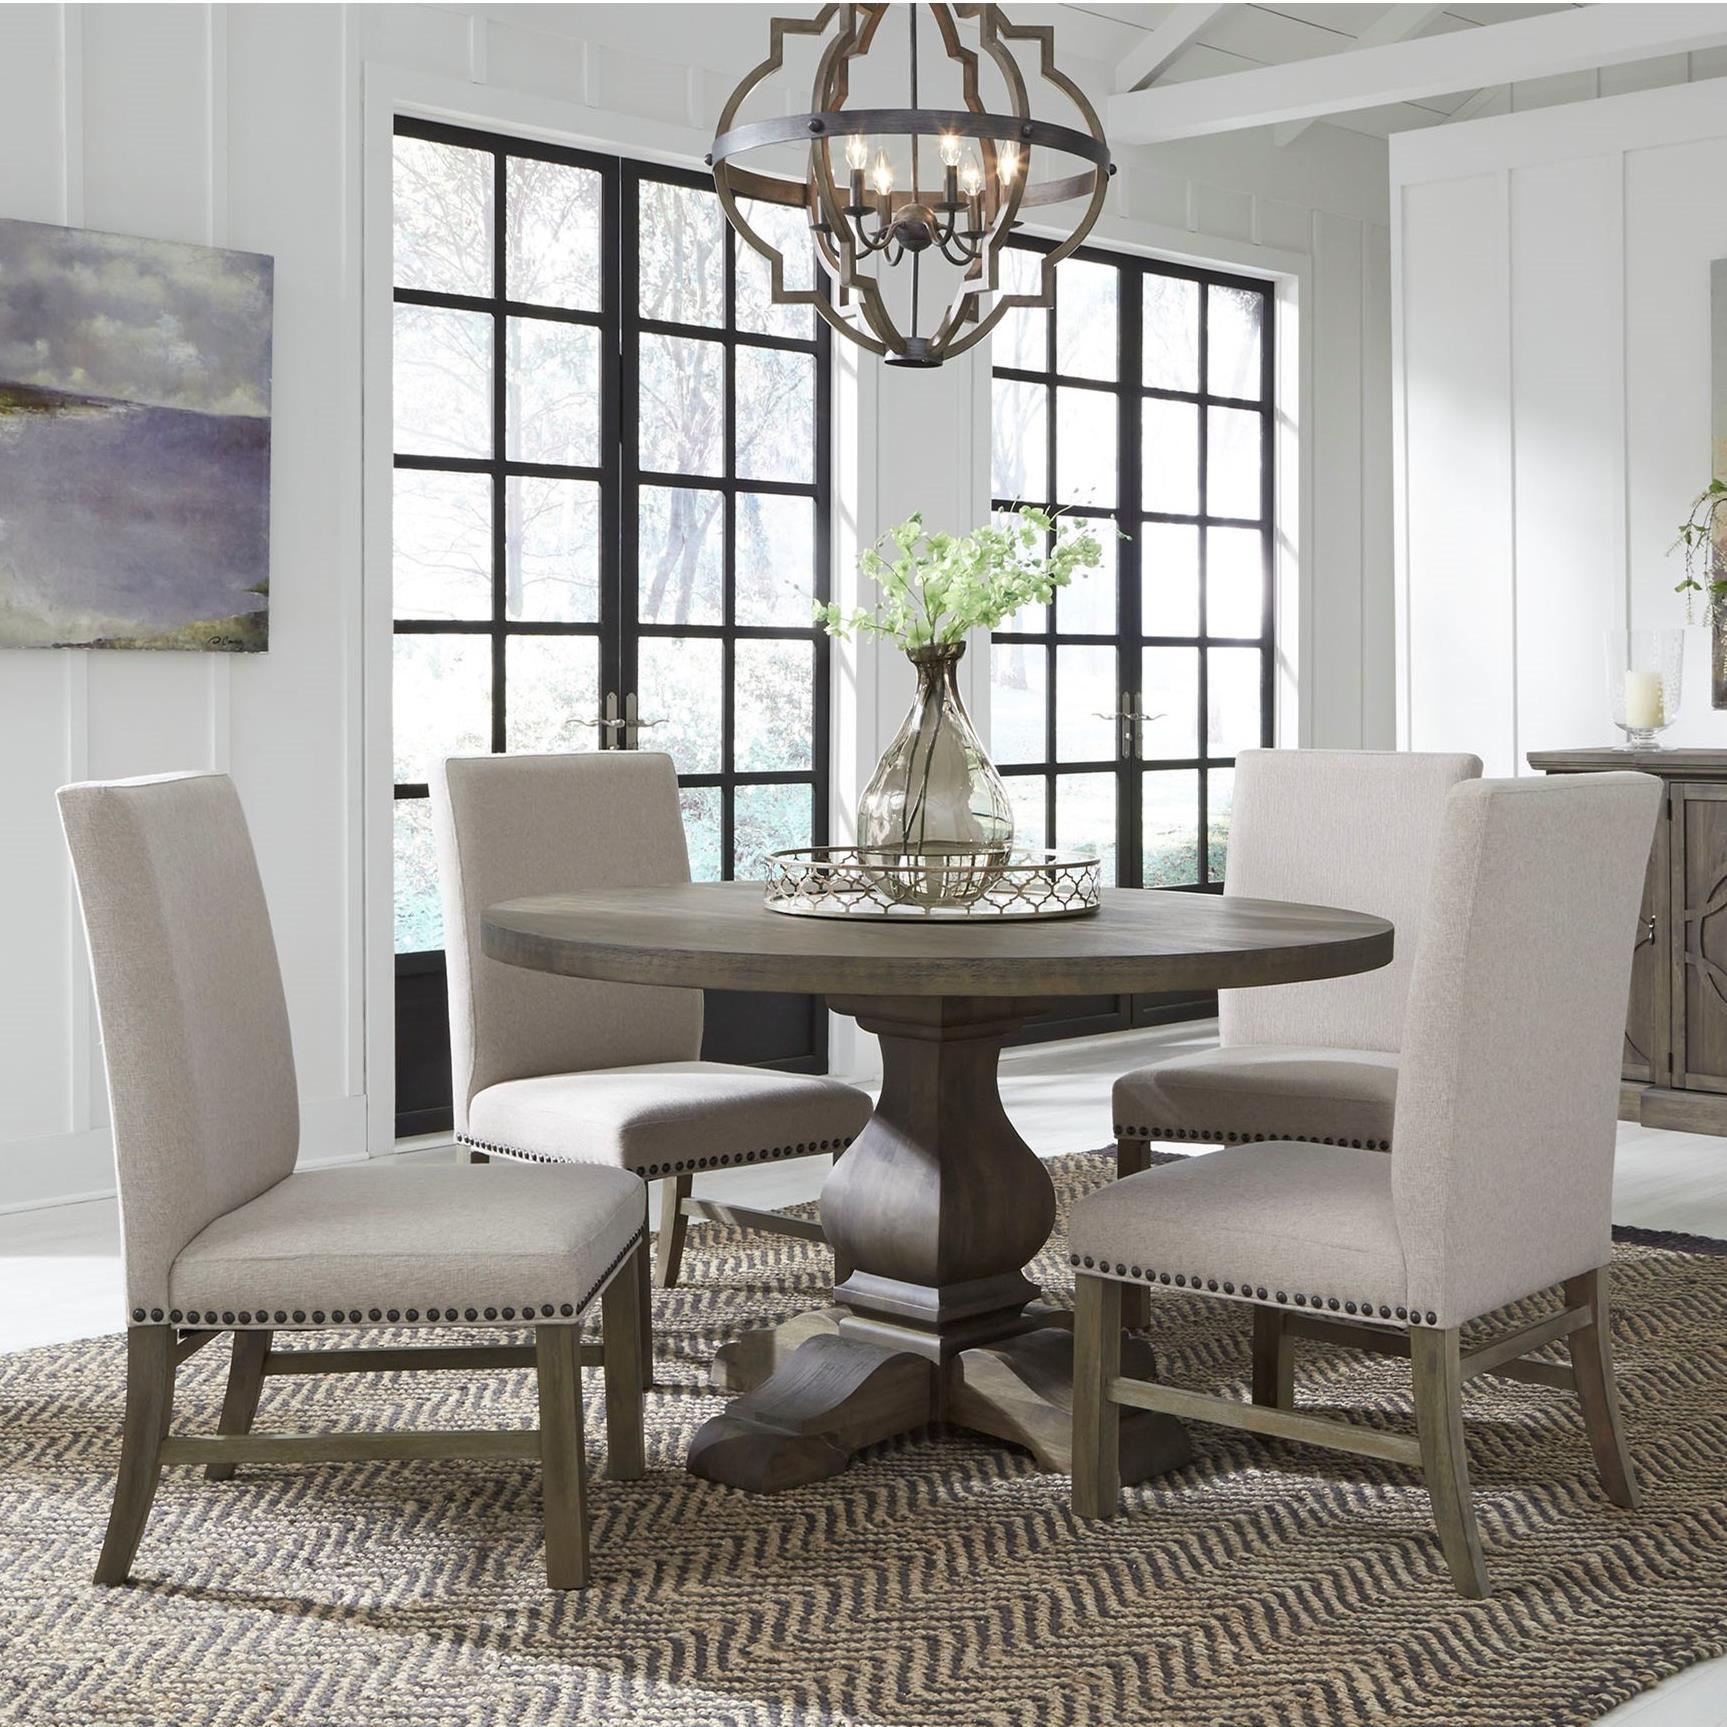 Standard Furniture Trenton 5 Pc Dining Set   Item Number:  19406+2019406+4X19413E